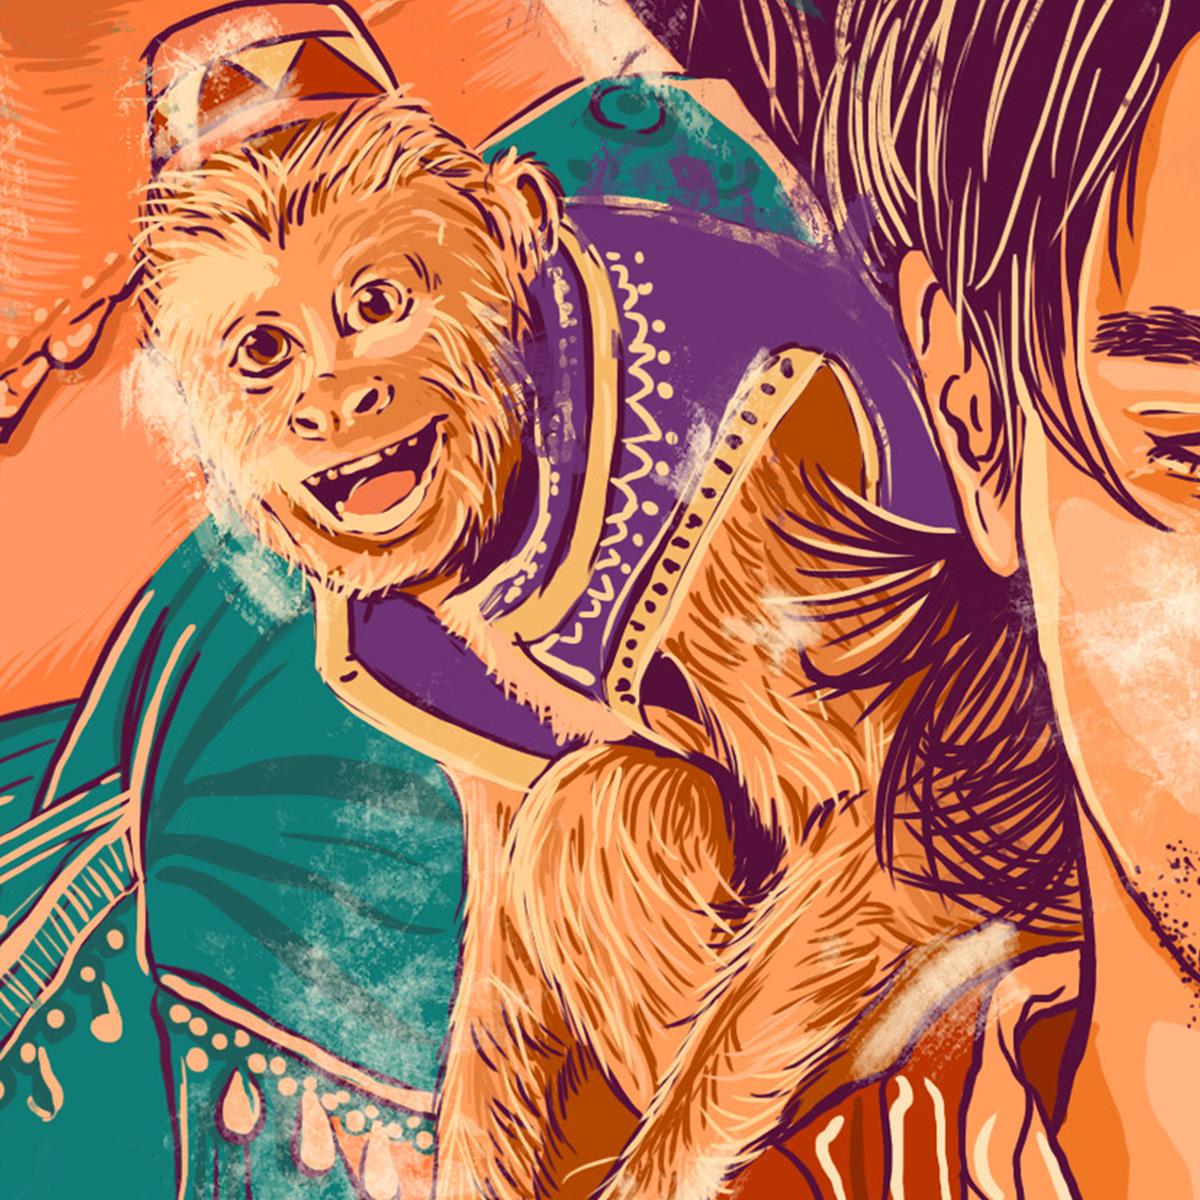 Aladdin Poster 2019 On Behance